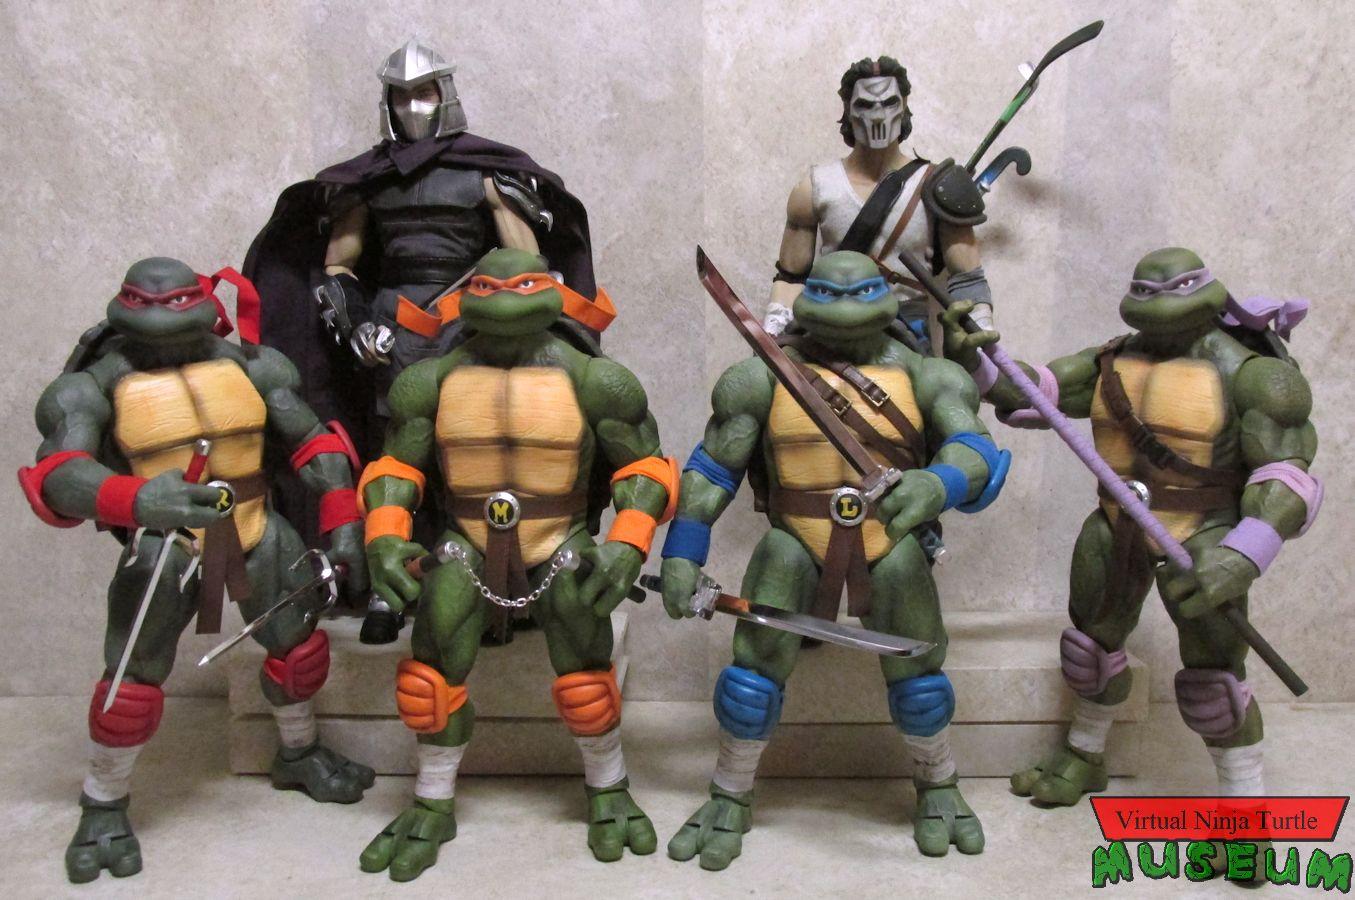 Dreamex 1 6 Scale Ninja Turtles Casey Jones And Shredder Review